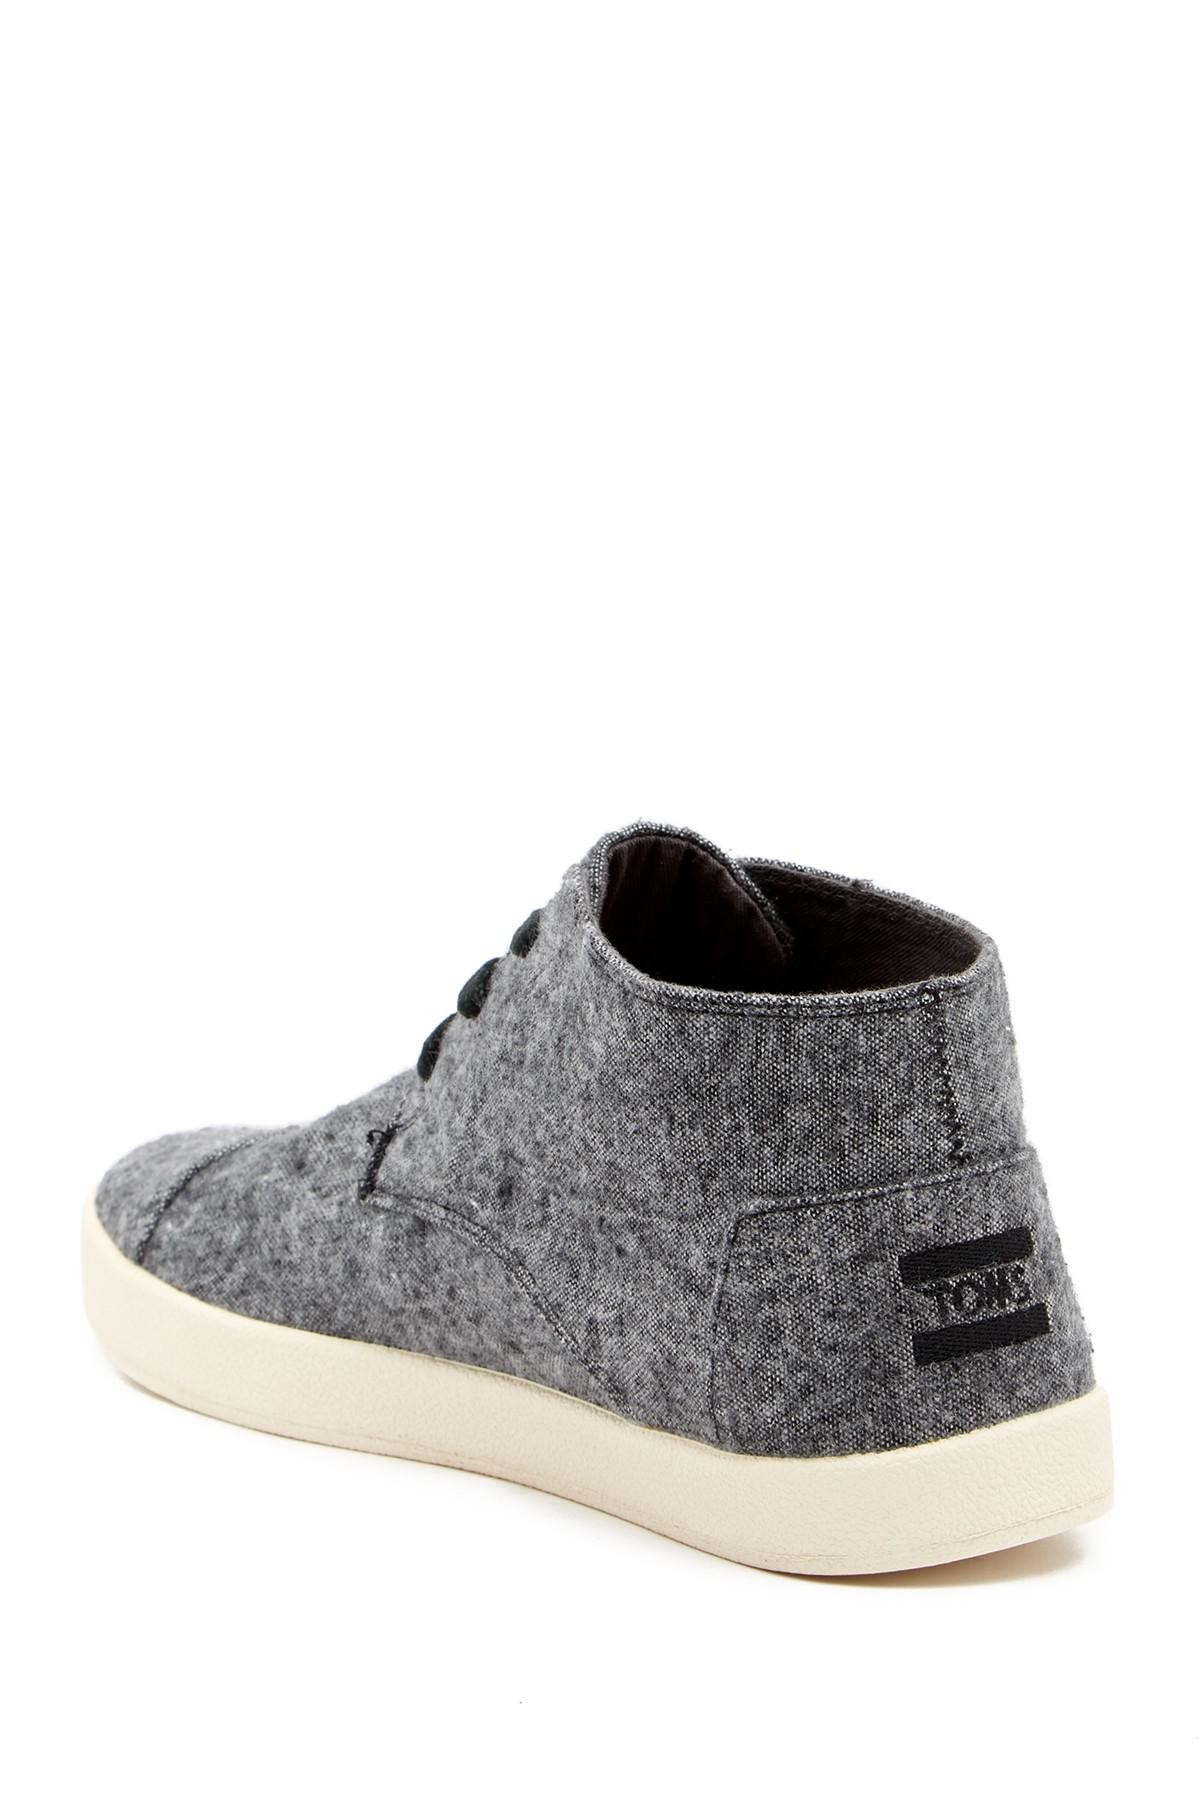 TOMS Paseo Slub Knit Mid Sneaker 9ZsOykLnU